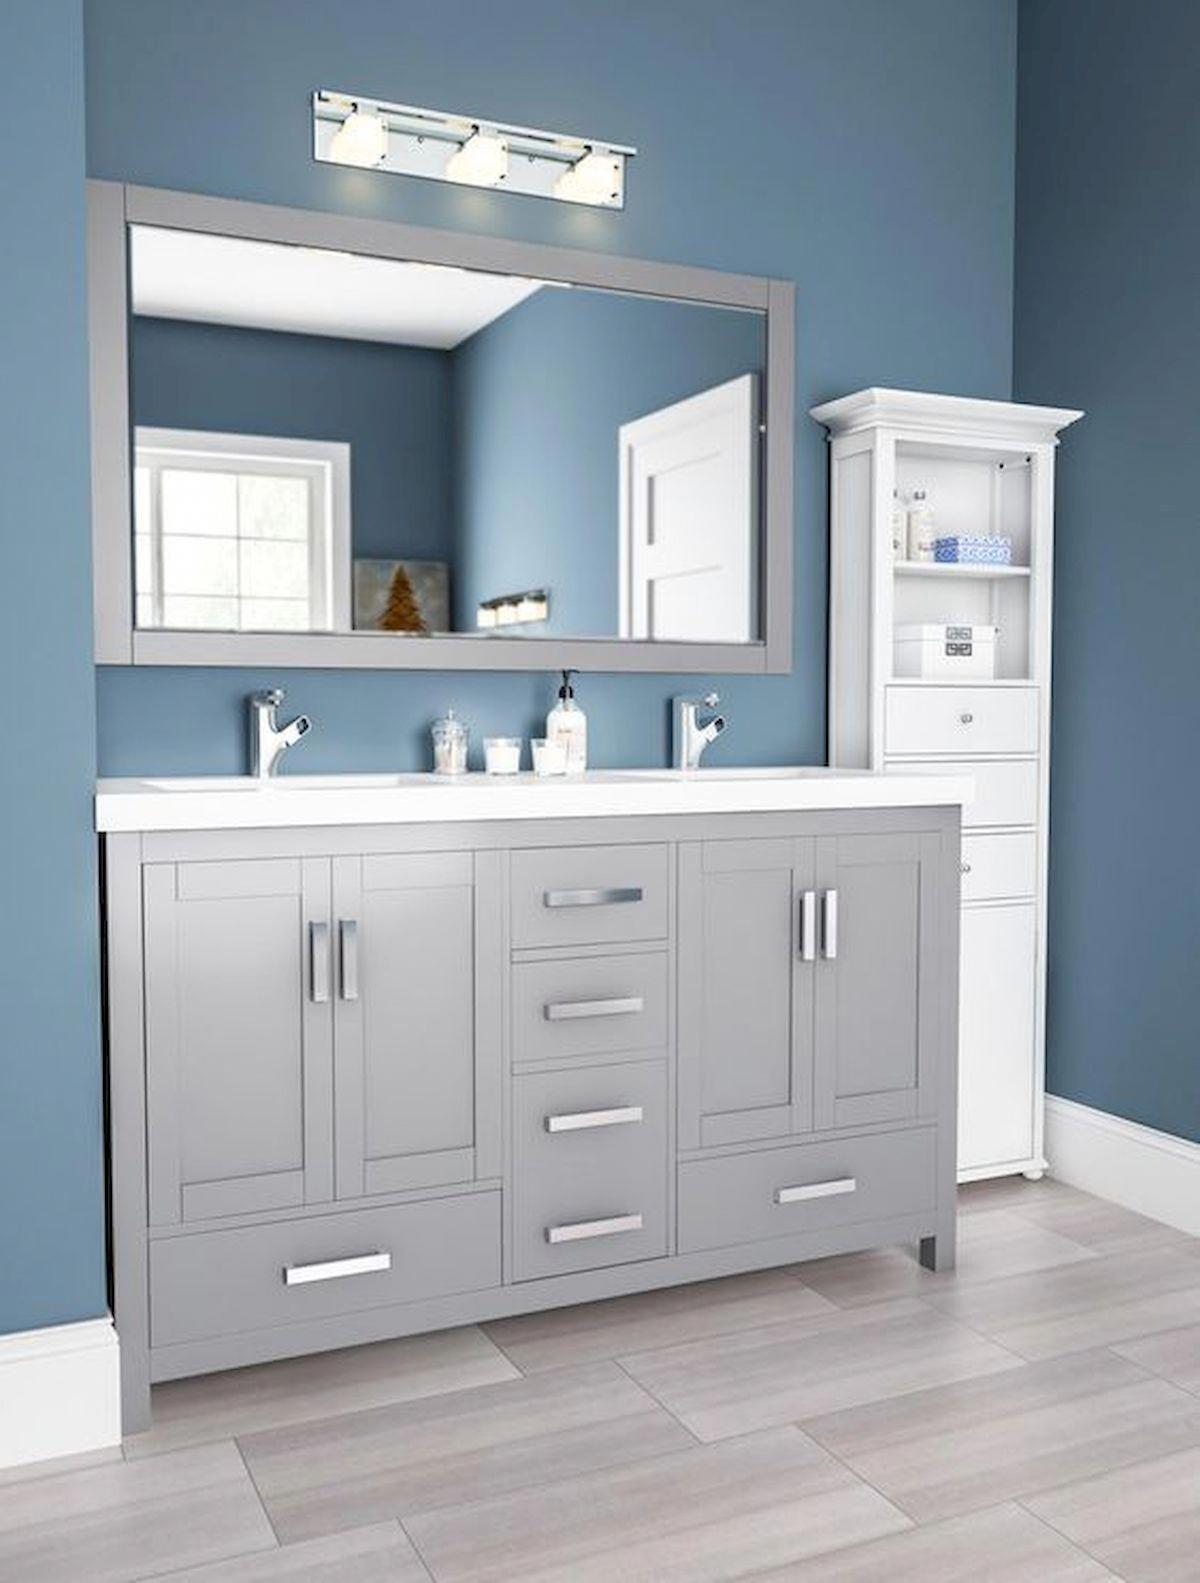 60 fantastic farmhouse bathroom vanity decor ideas and remodel peindre salle de bain salle de